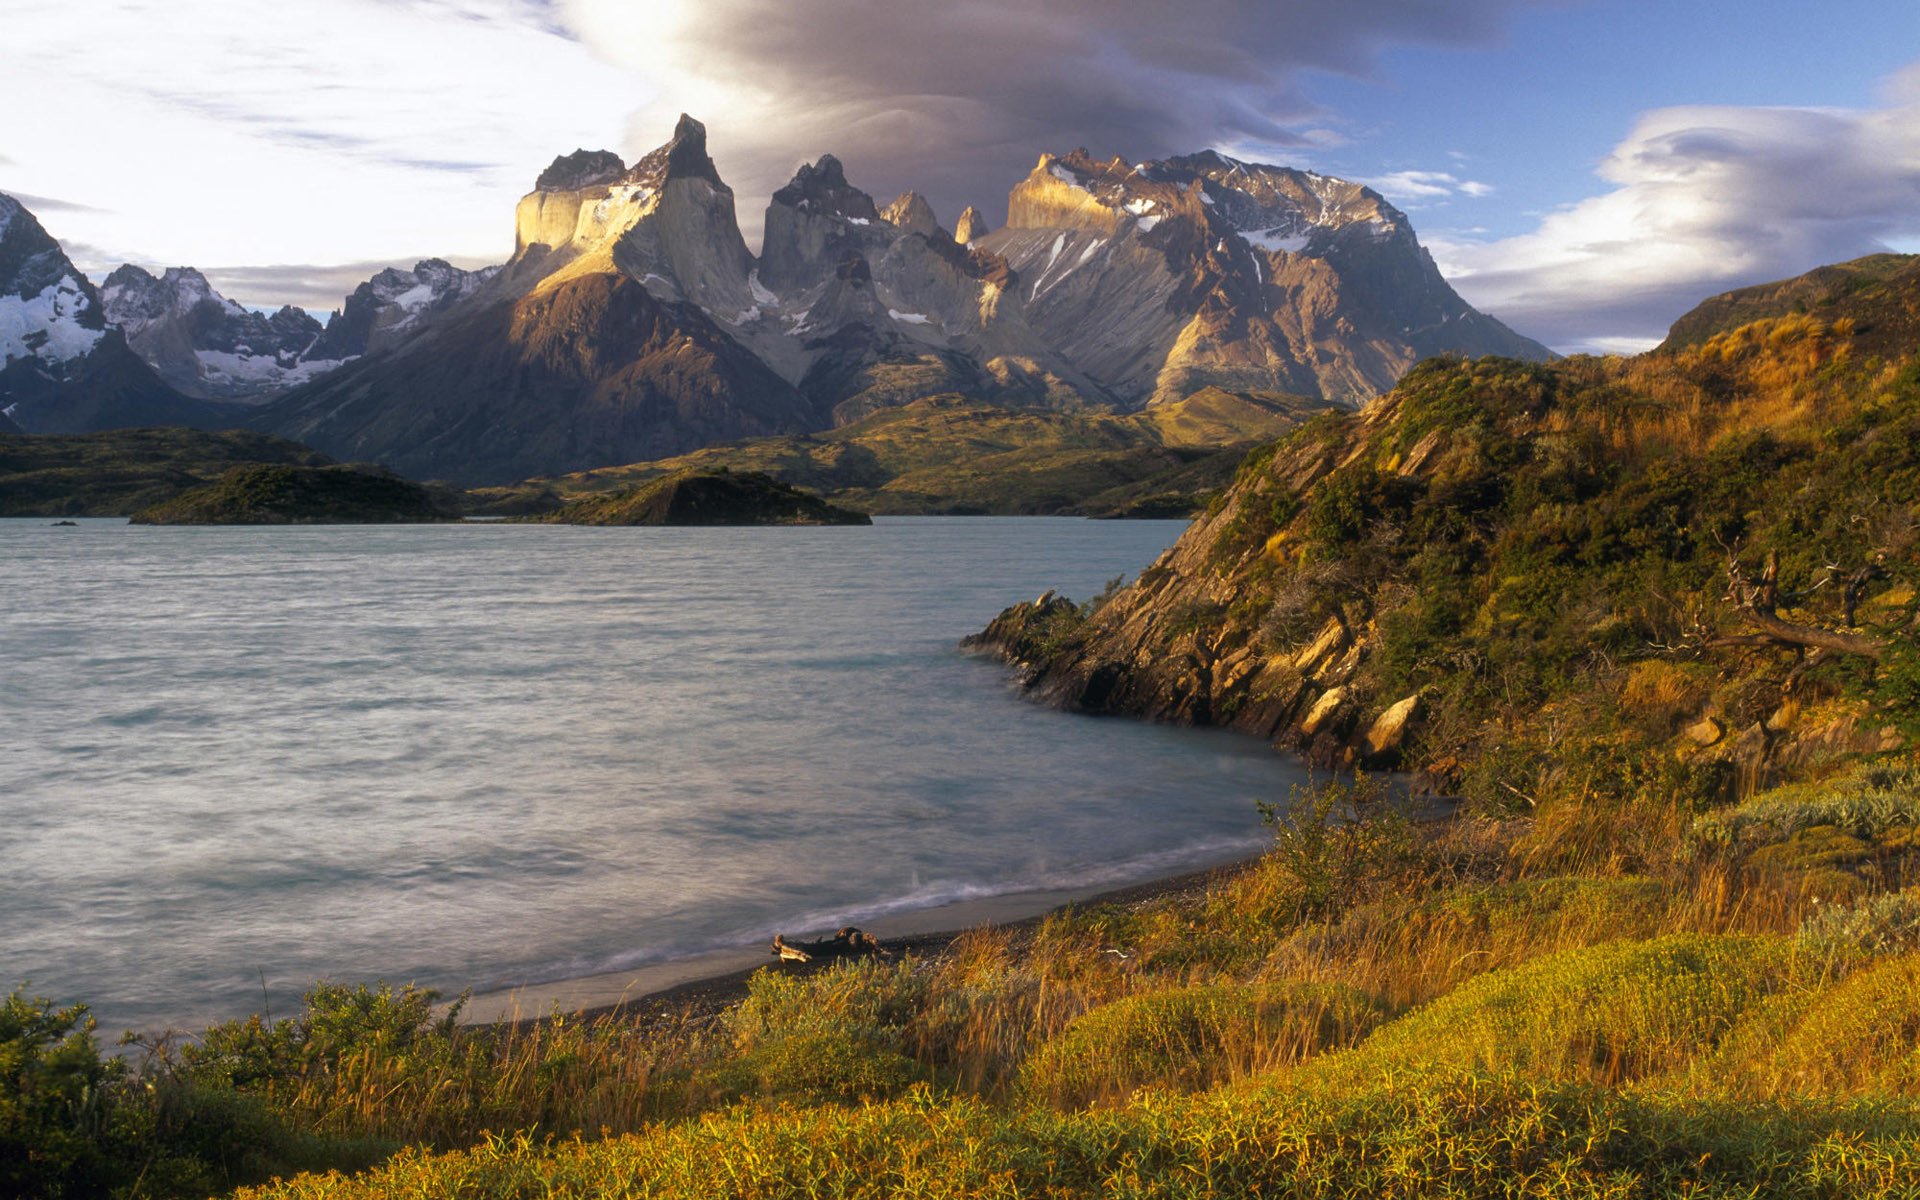 beautiful landscape photos   File Name : Beautiful Landscape HD Wallpapers